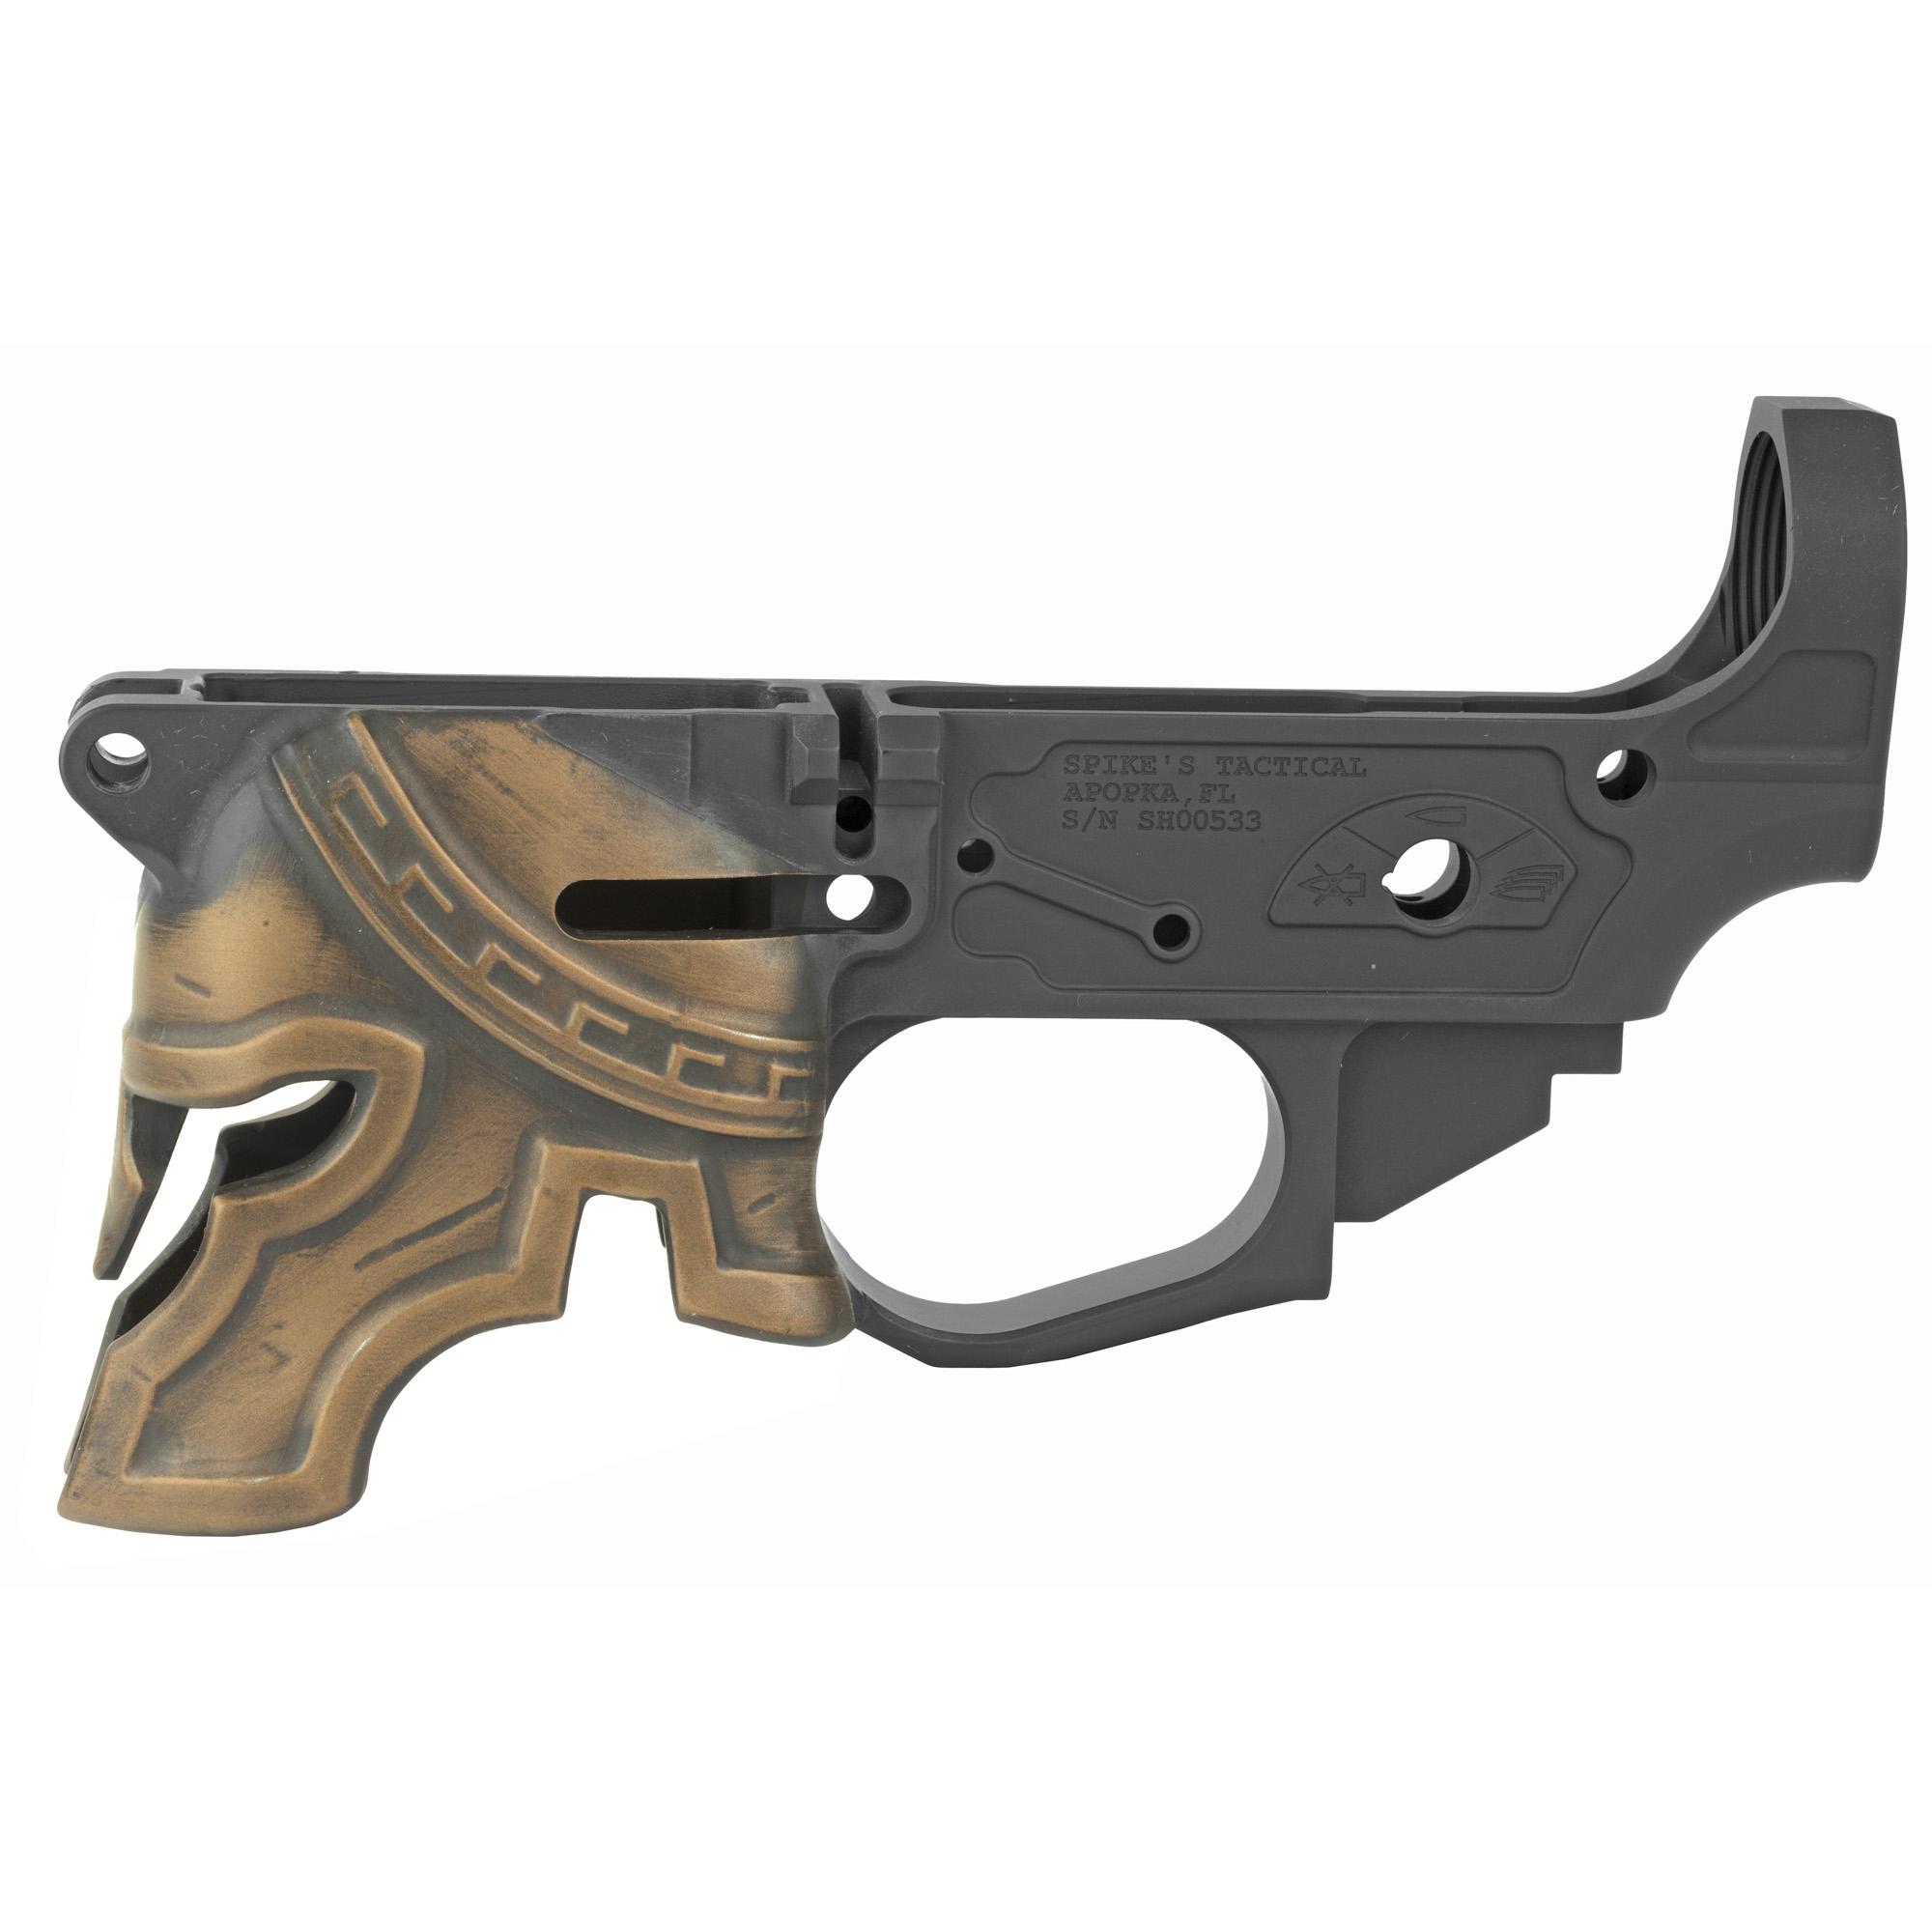 Spike's Tactical Spartan Color Filled Lower 223 Remington 5 56 NATO - Black